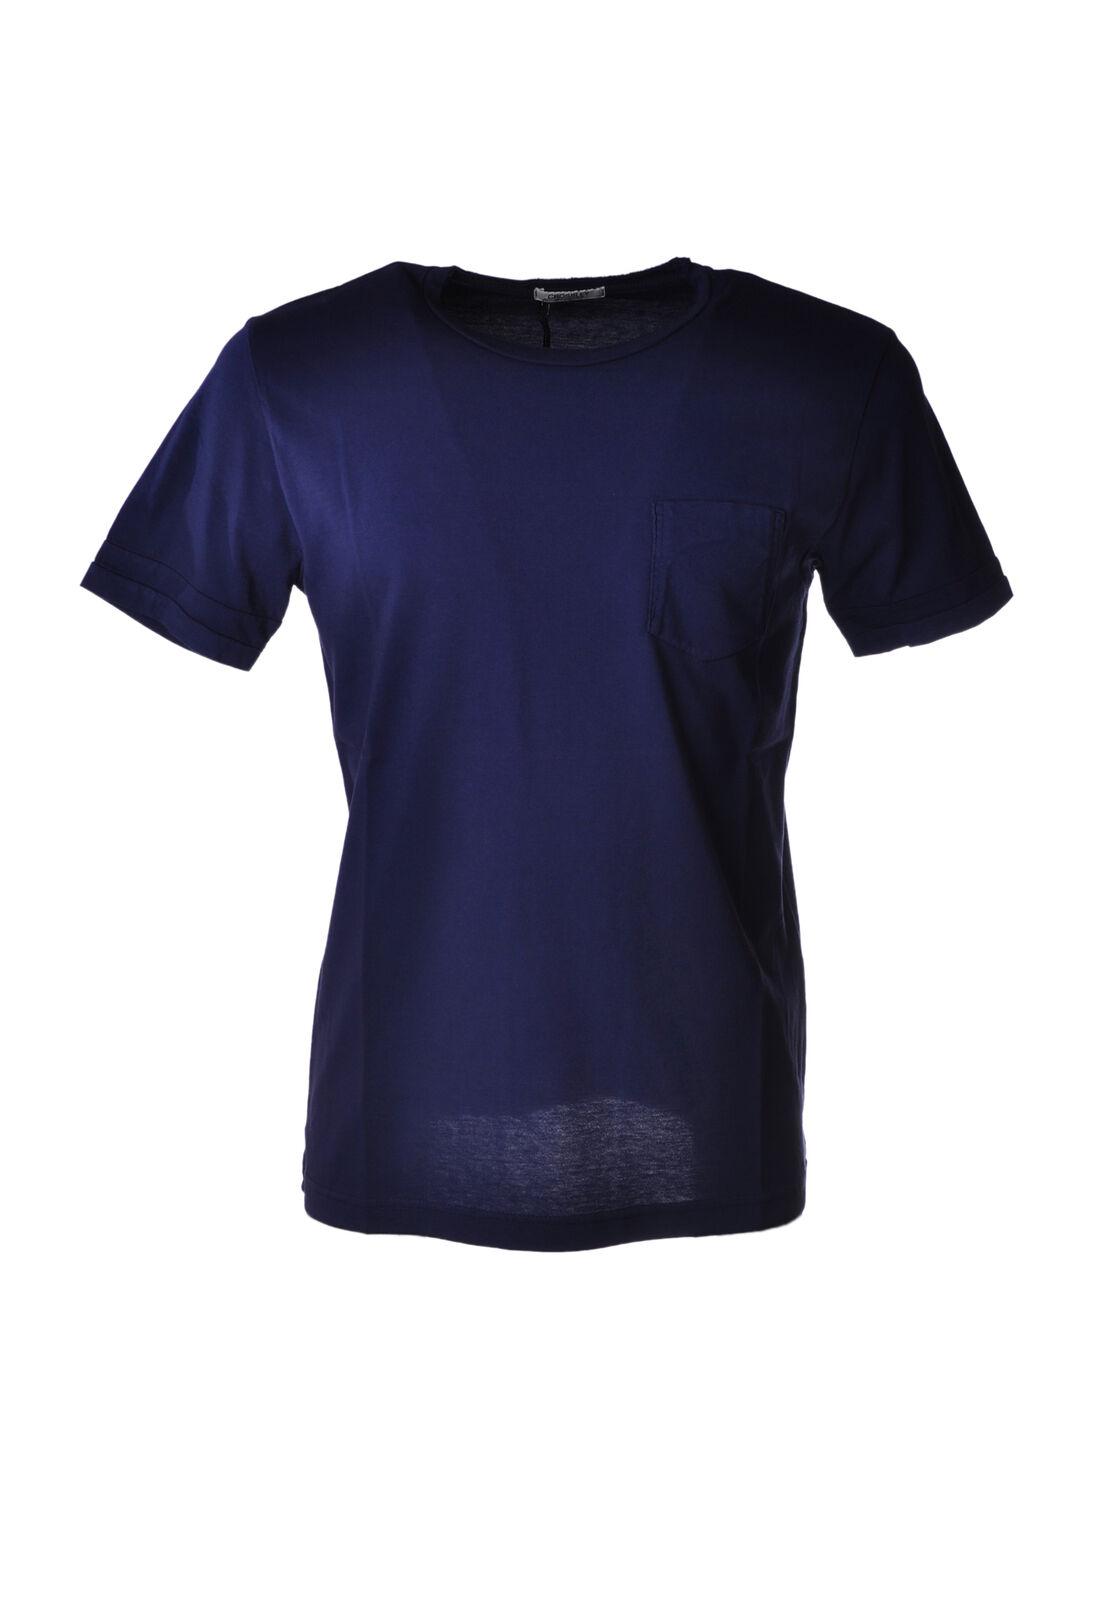 CROSSLEY - Topwear-T-shirts - Man - bluee - 5021418G184320